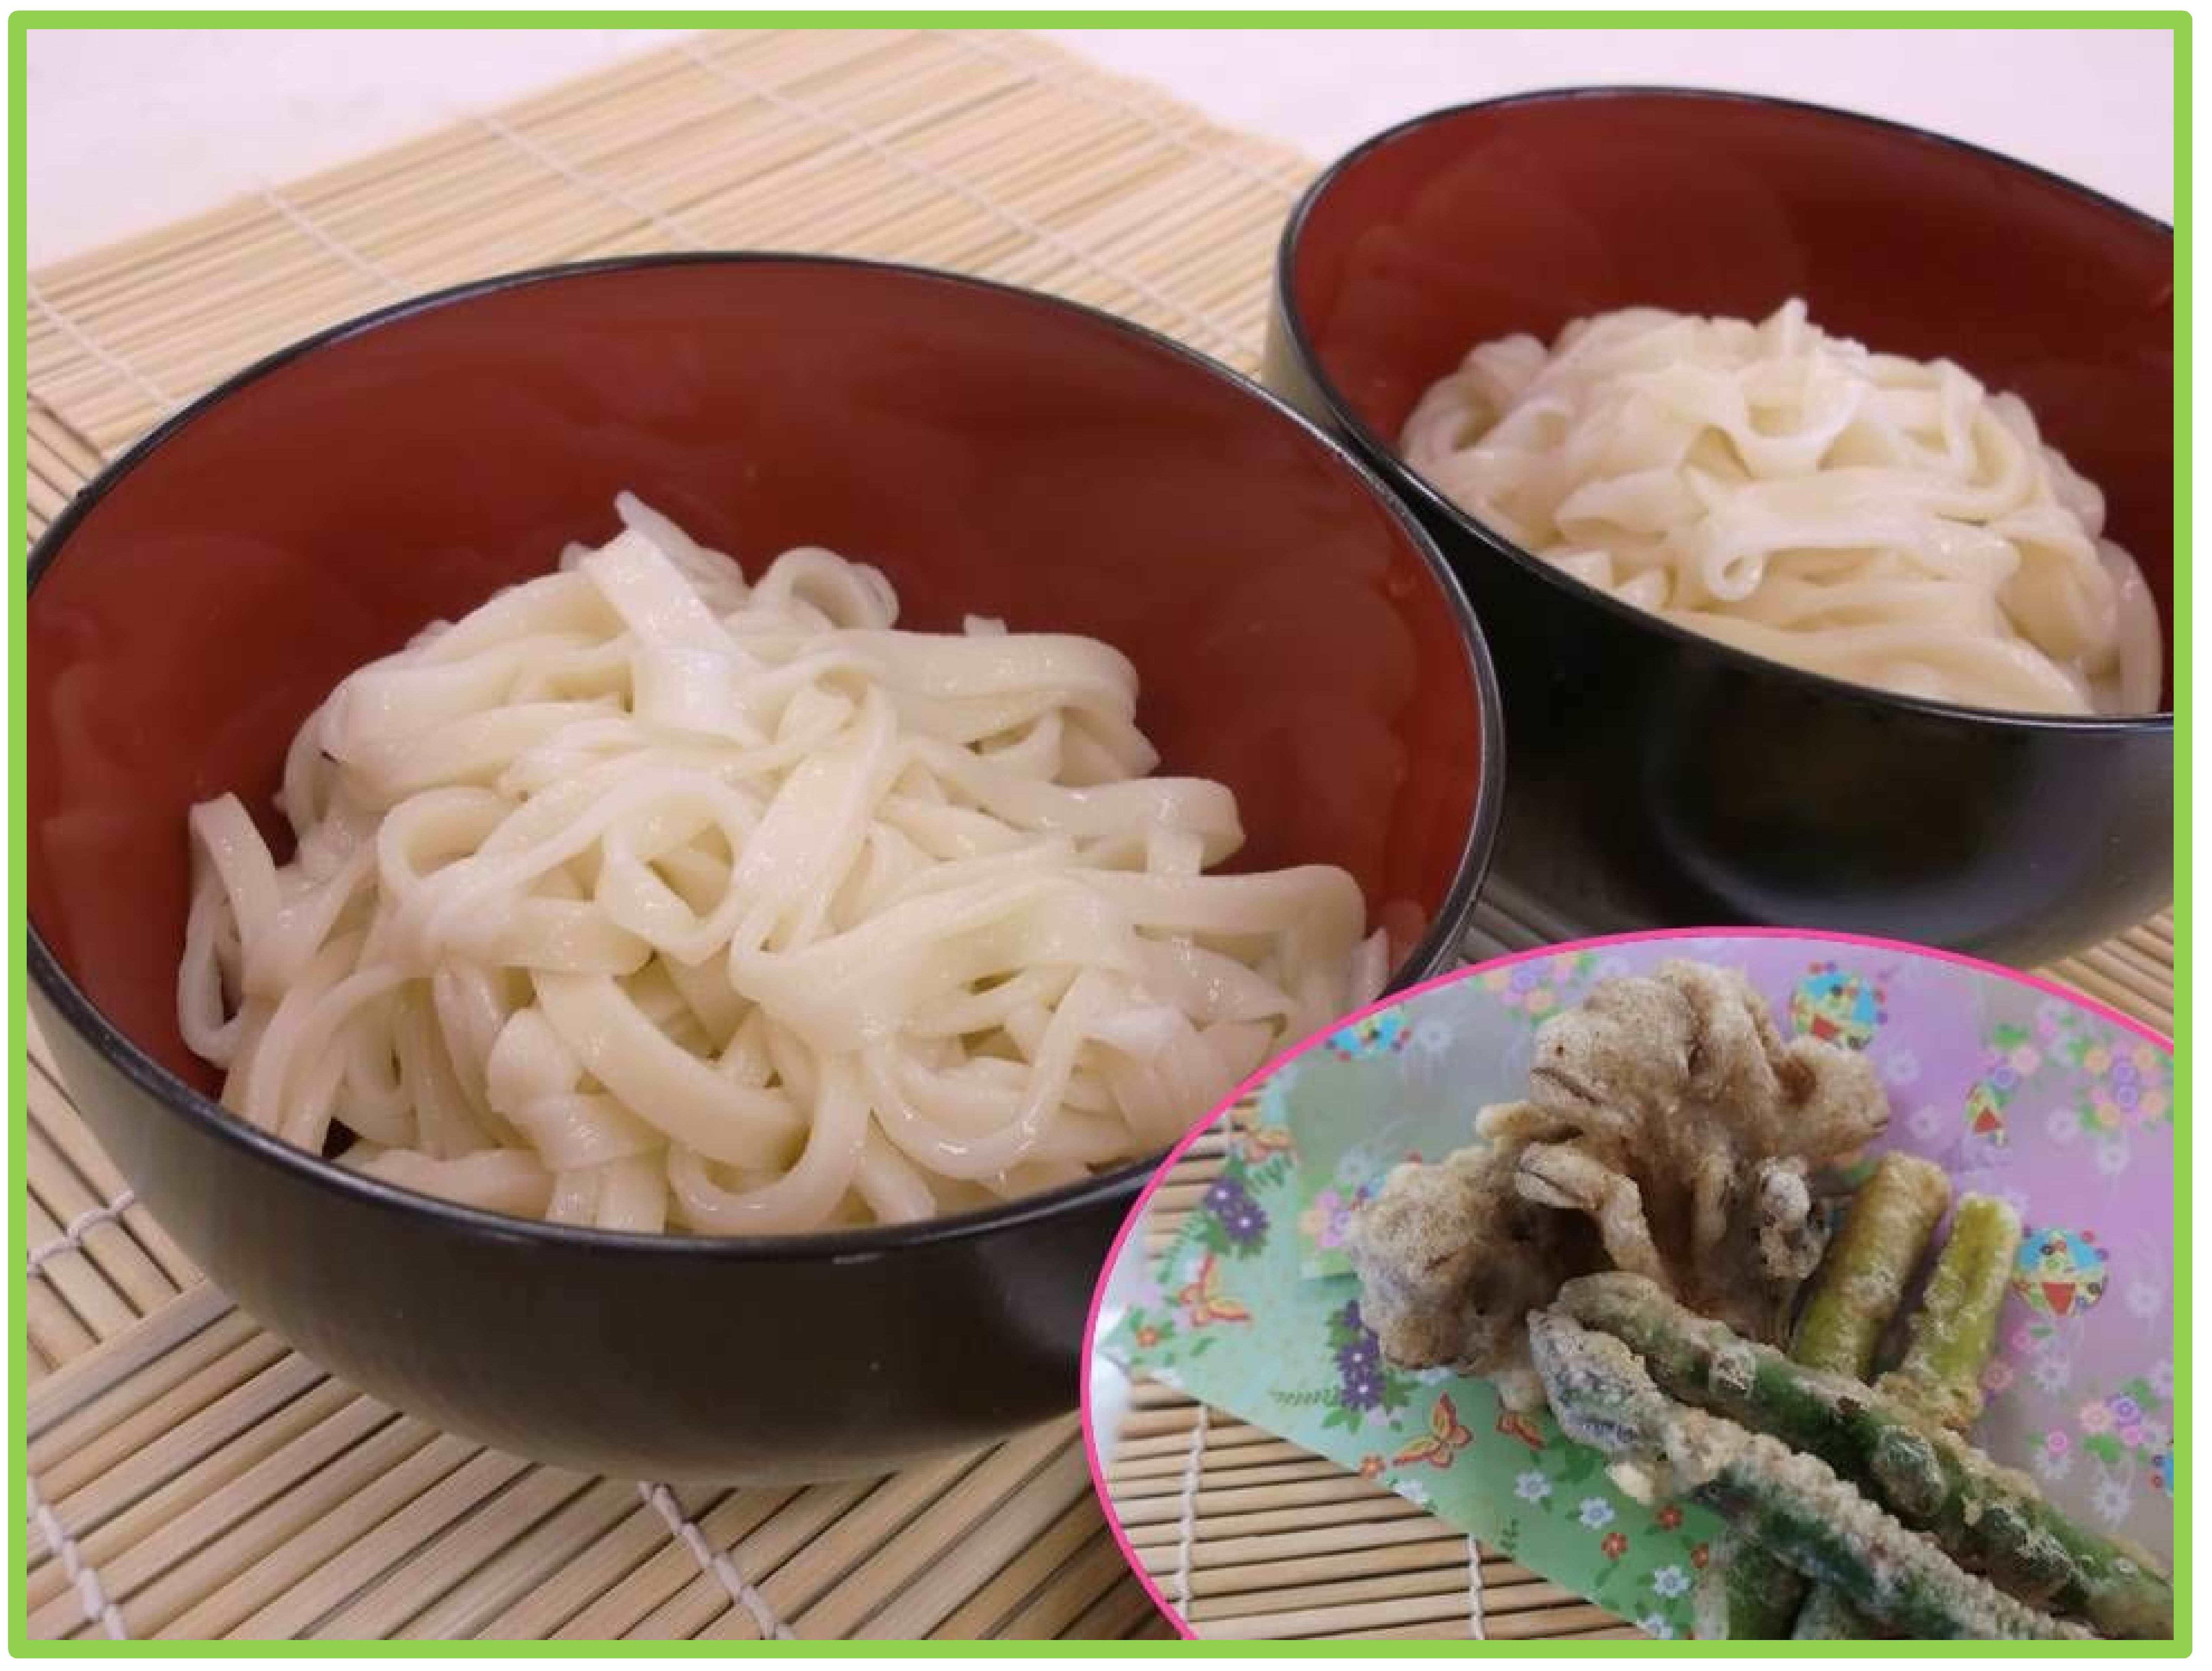 【GW企画】足でフミフミ手打ちうどんを作ろう(旬野菜の天ぷら付)